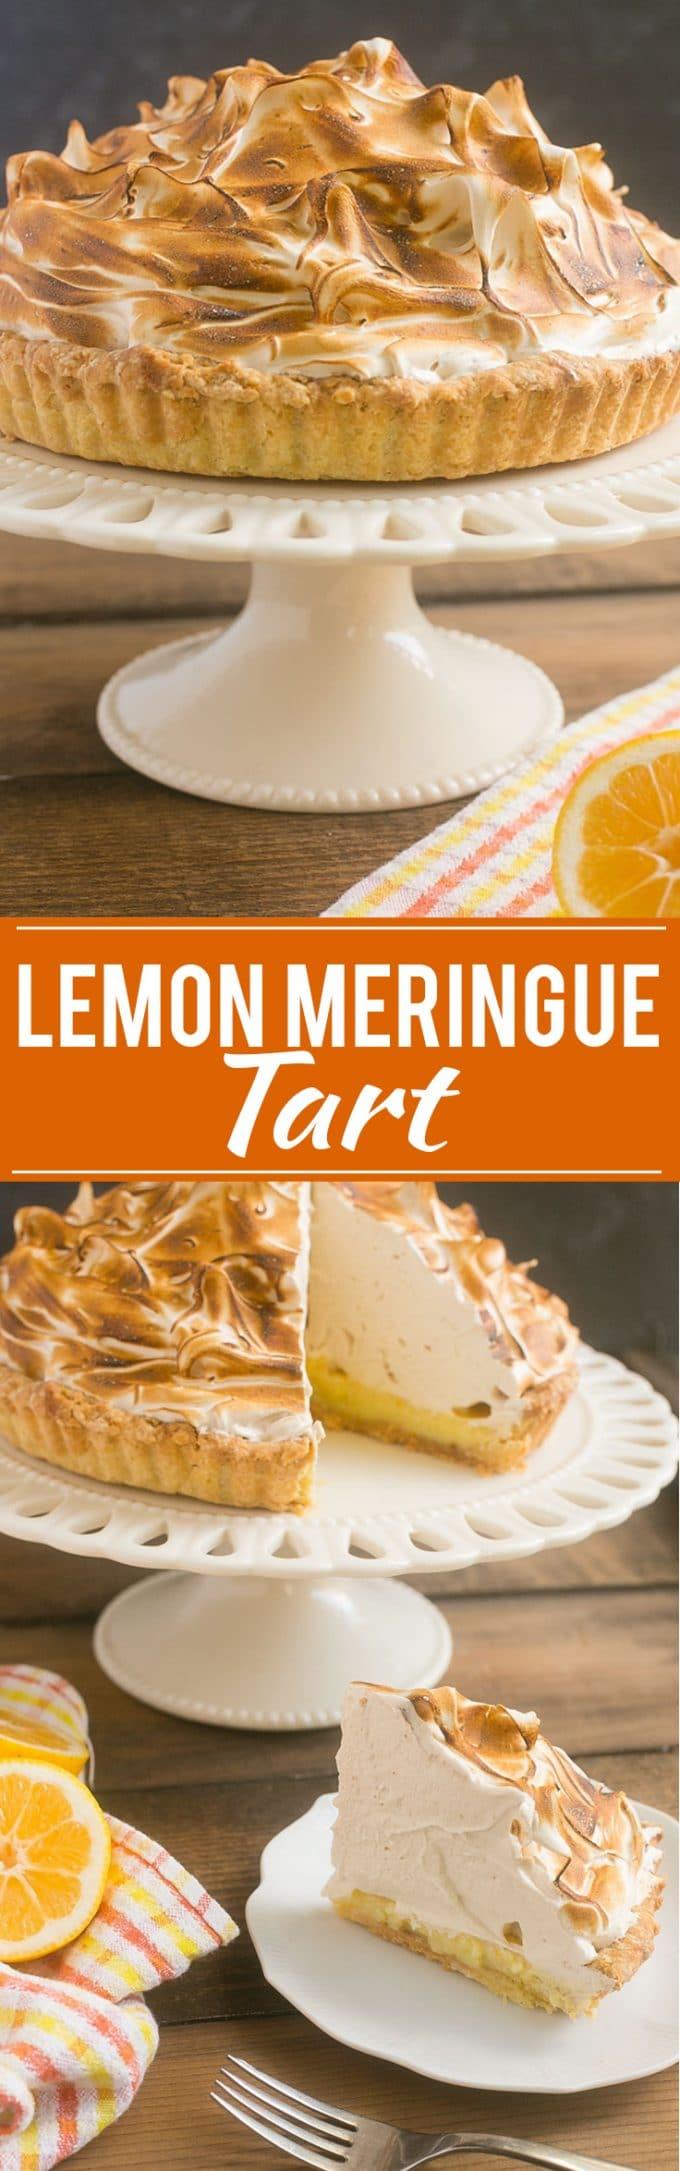 Brown Sugar Lemon Meringue Tart | Lemon Tart with Brown Sugar Meringue | Best Brown Sugar Meringue | Best Lemon Tart | Brown Sugar Meringue